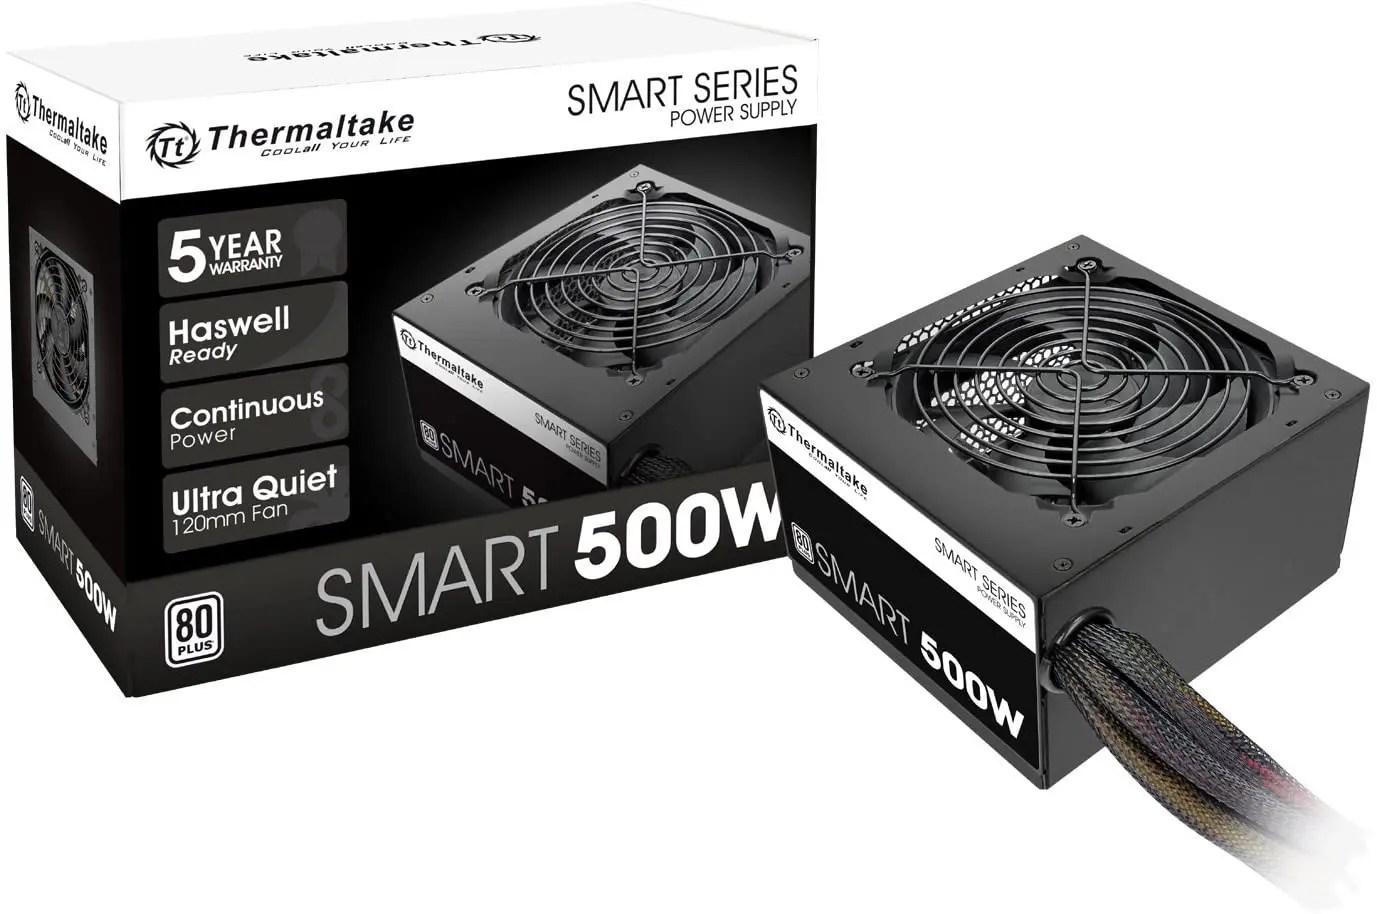 thermaltake smart 500w psu image